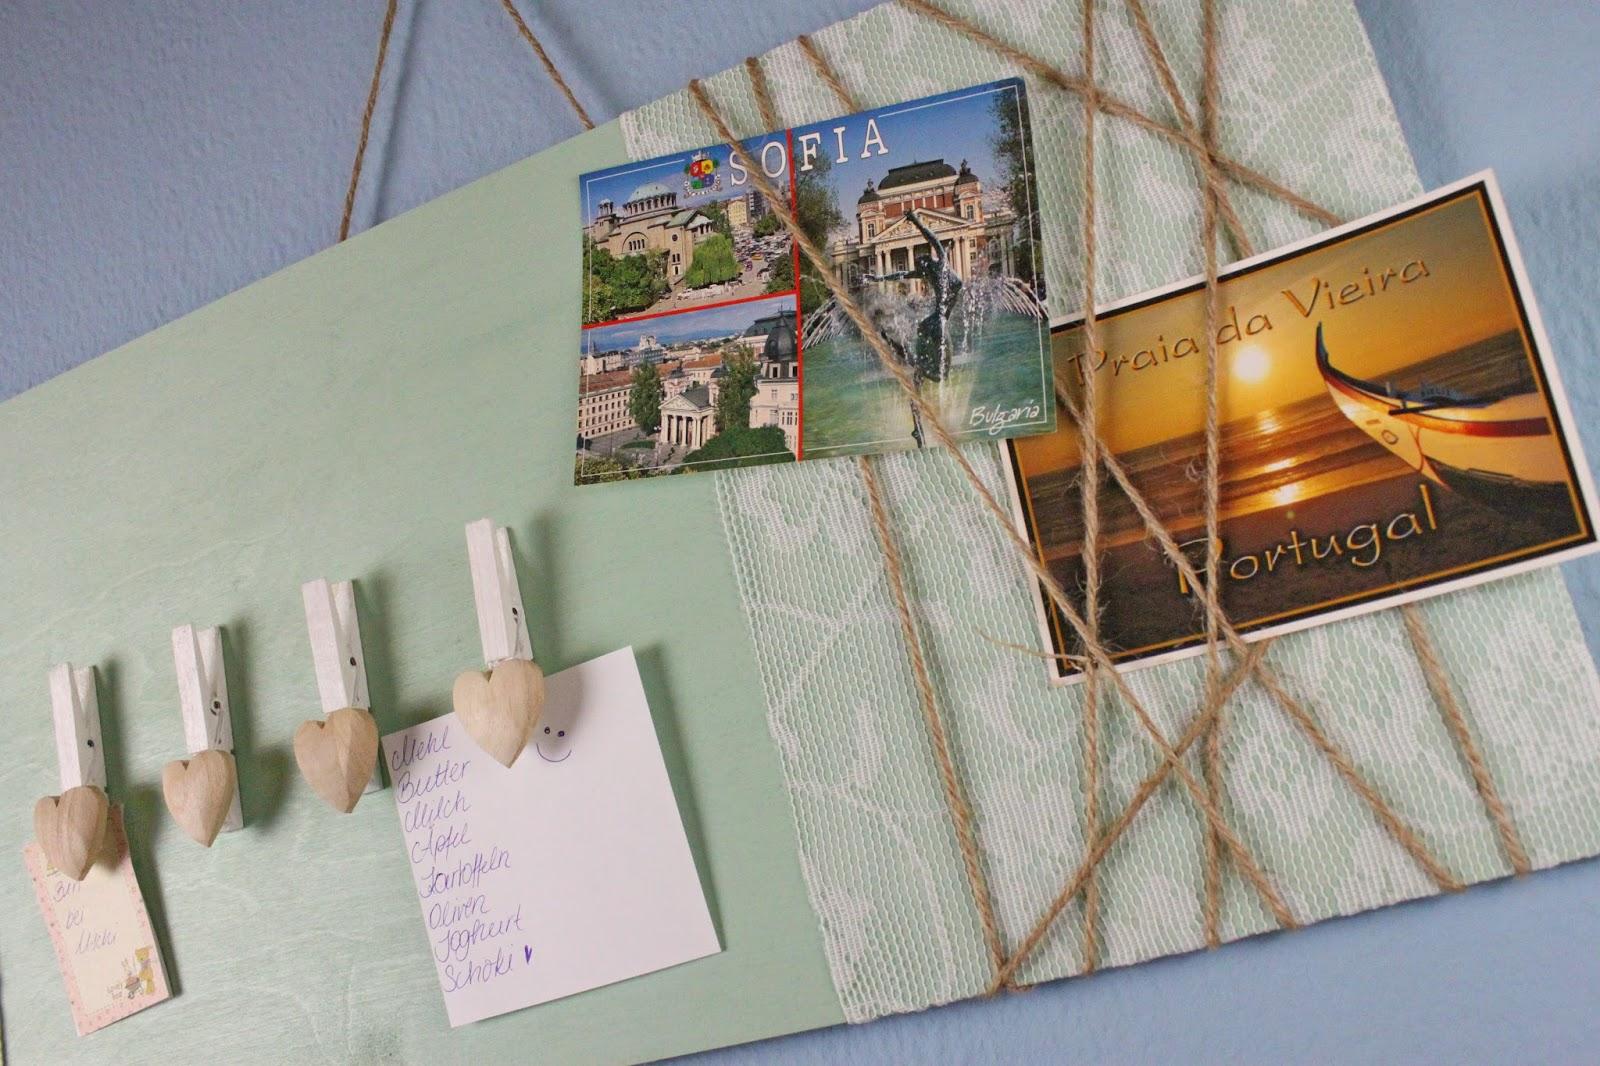 diy deko f r die wand memoboard selber machen jamblog. Black Bedroom Furniture Sets. Home Design Ideas